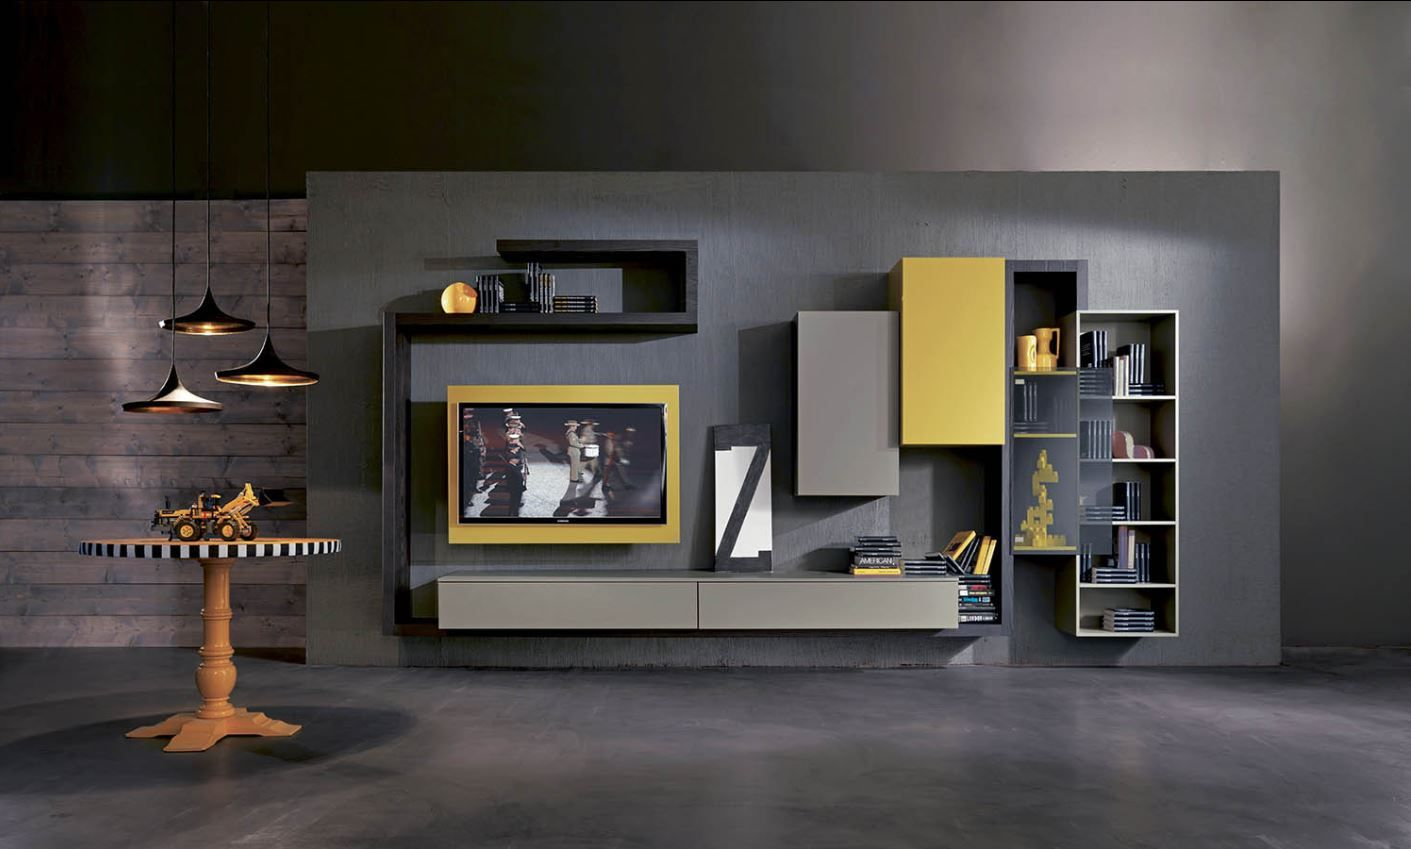 Modern Wall Units Italian Furniture Lar 32 Jpg 1411 849 Wall Unit Designs Living Room Tv Wall Modern Wall Units #wall #panel #design #for #living #room